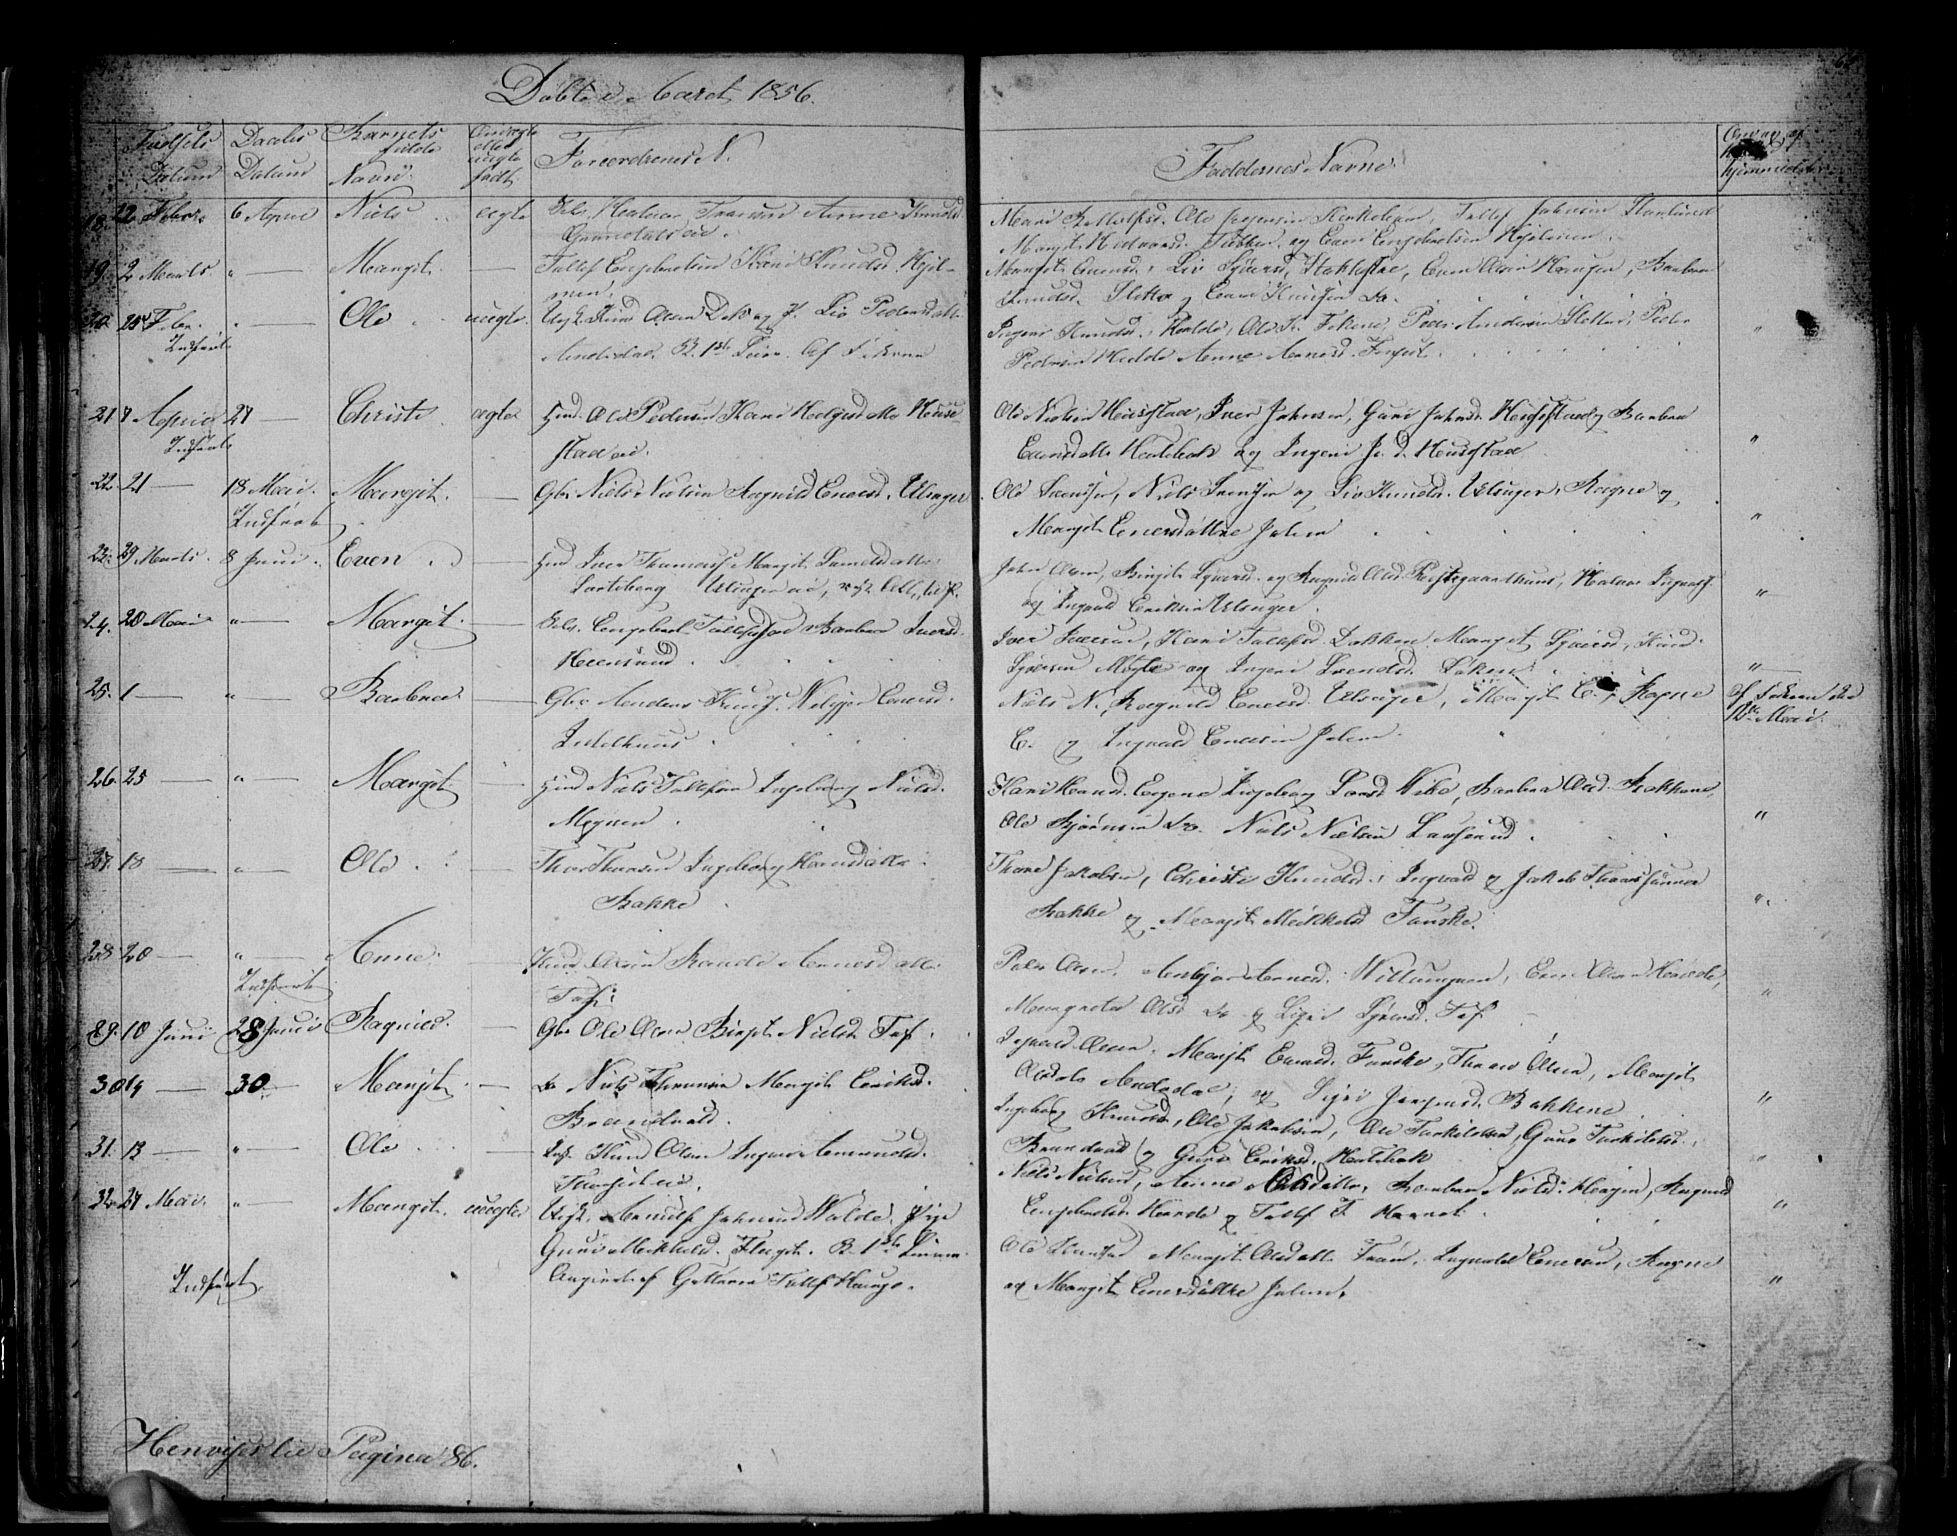 SAKO, Gol kirkebøker, G/Gb/L0003: Klokkerbok nr. II 3, 1844-1858, s. 64-65